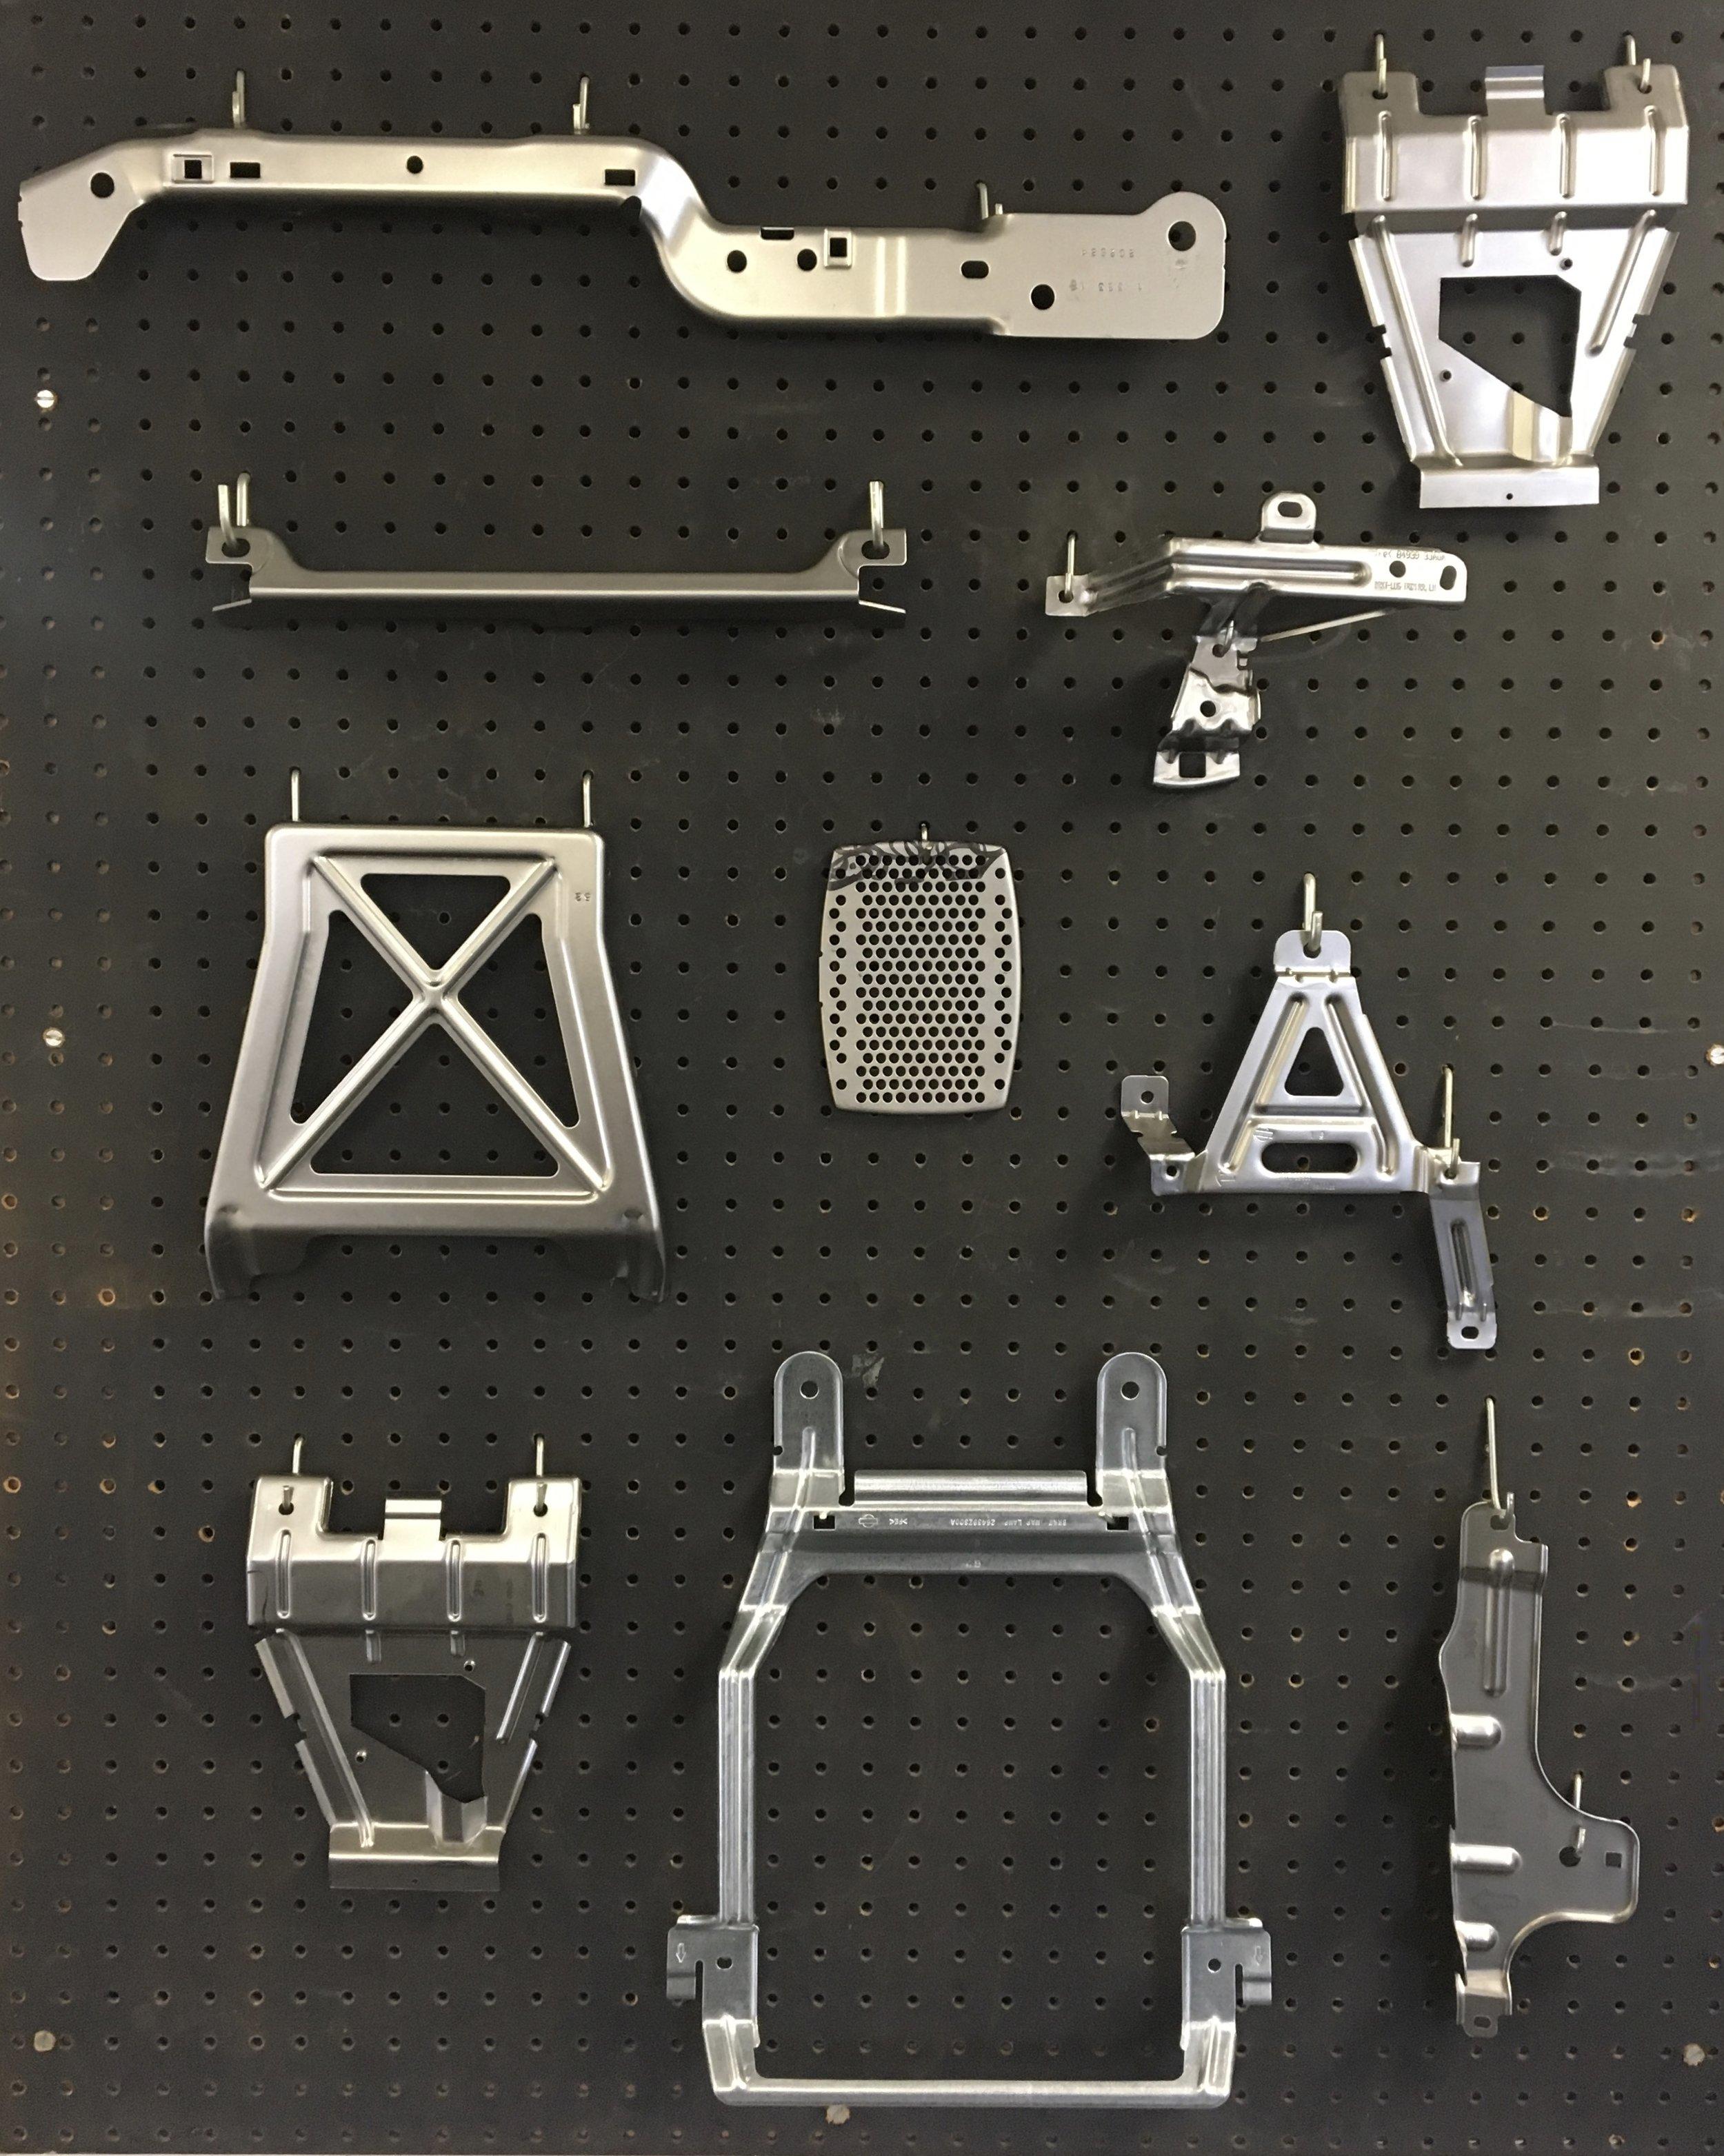 L/R arm rest, map lamp bracket, seat components, filter grid